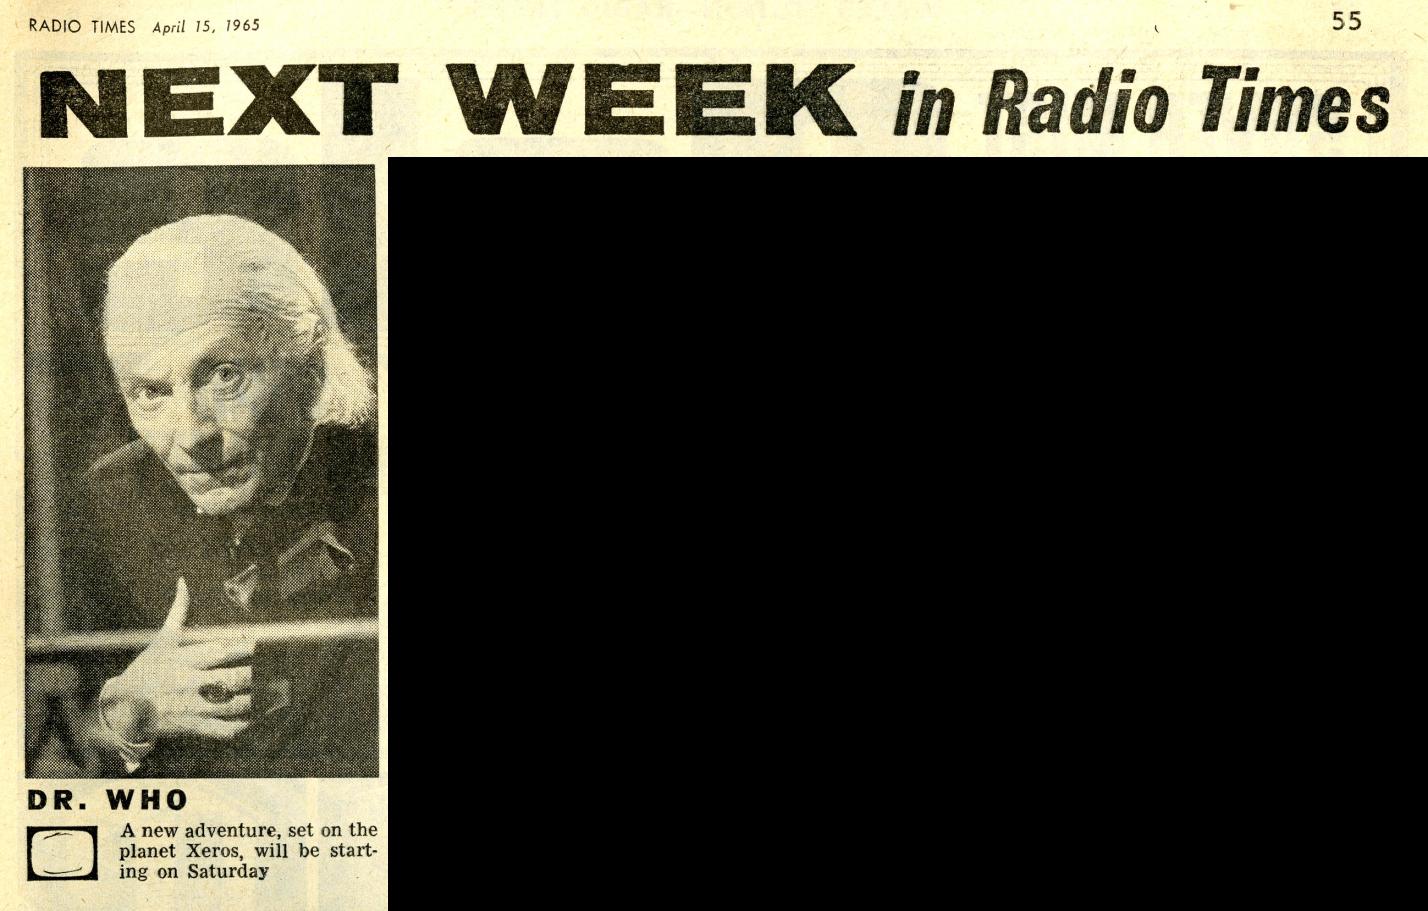 Radio Times, April 17-23, 1965